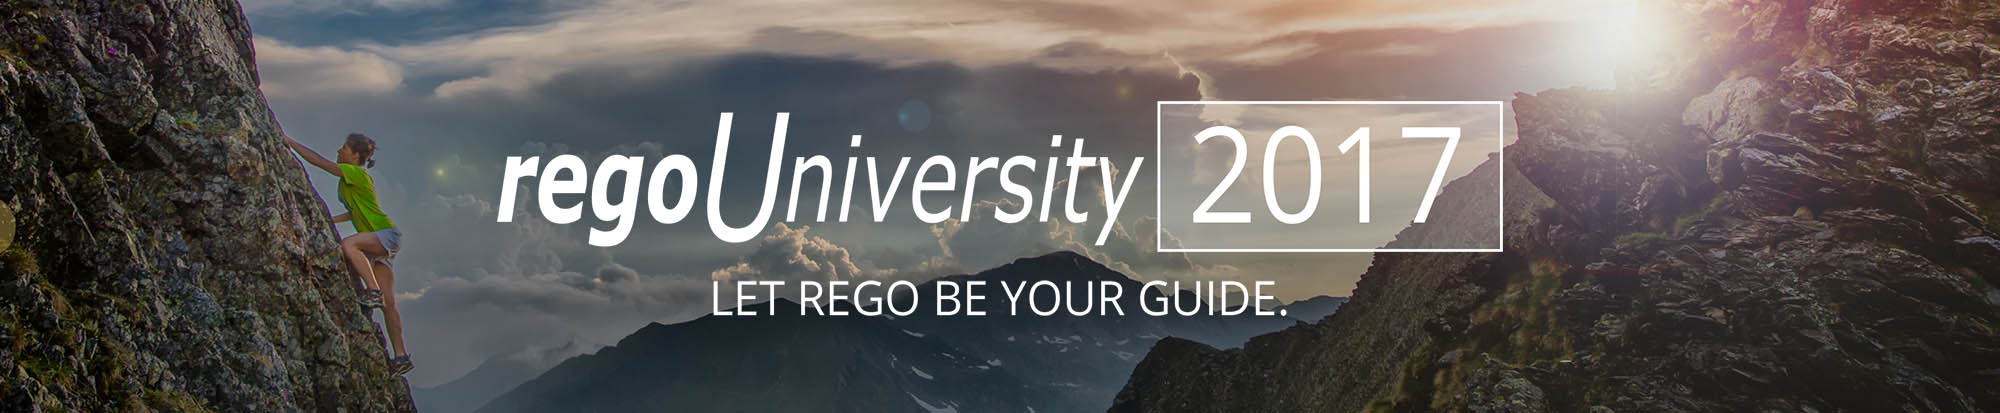 Rego University 2017